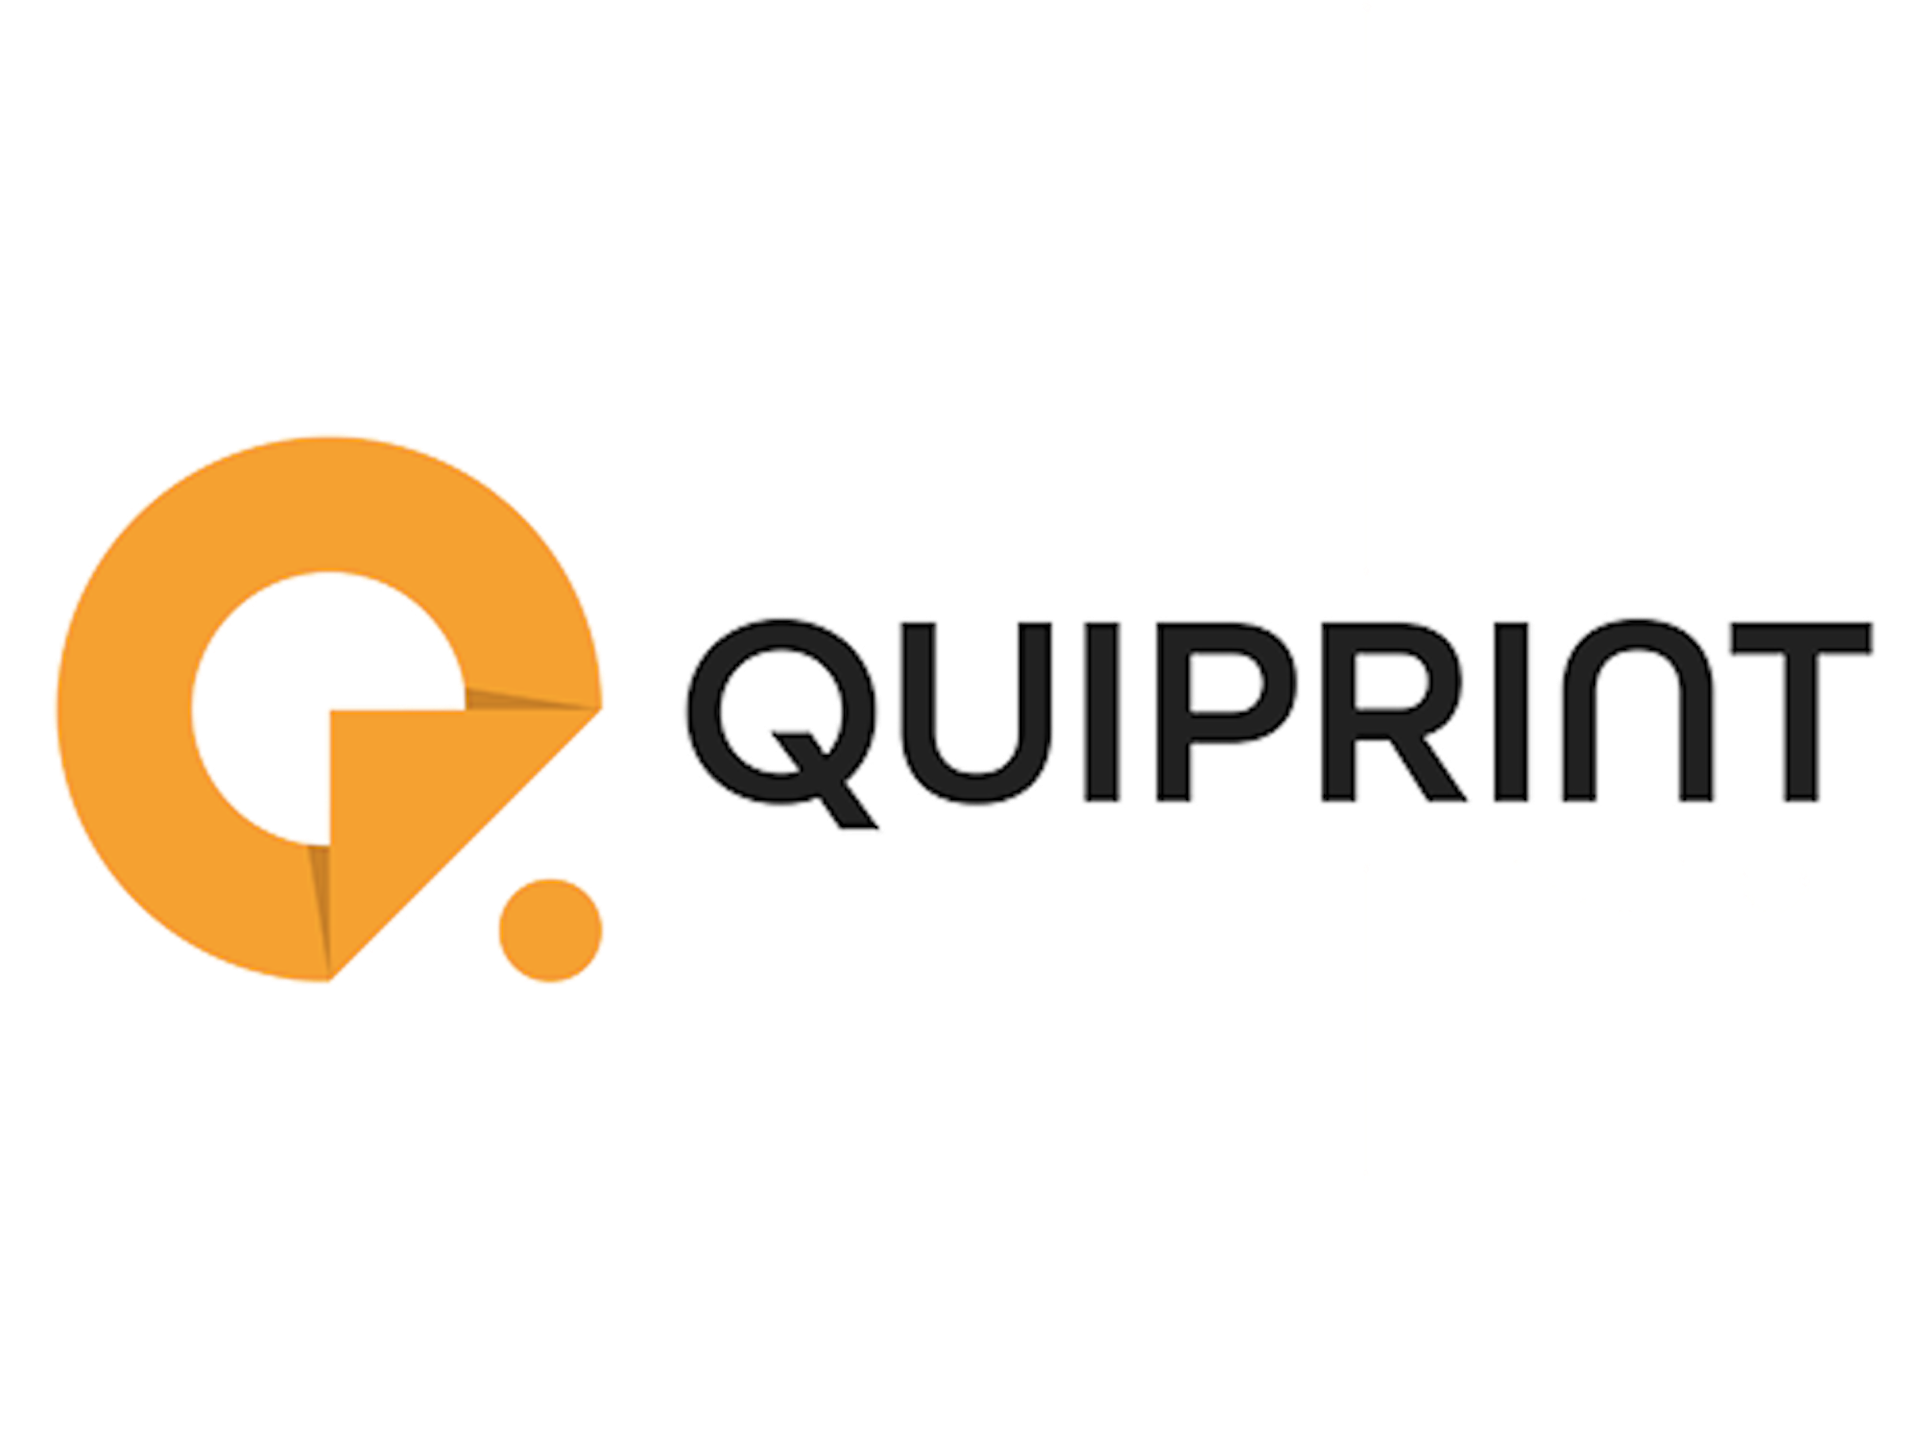 Quiprint